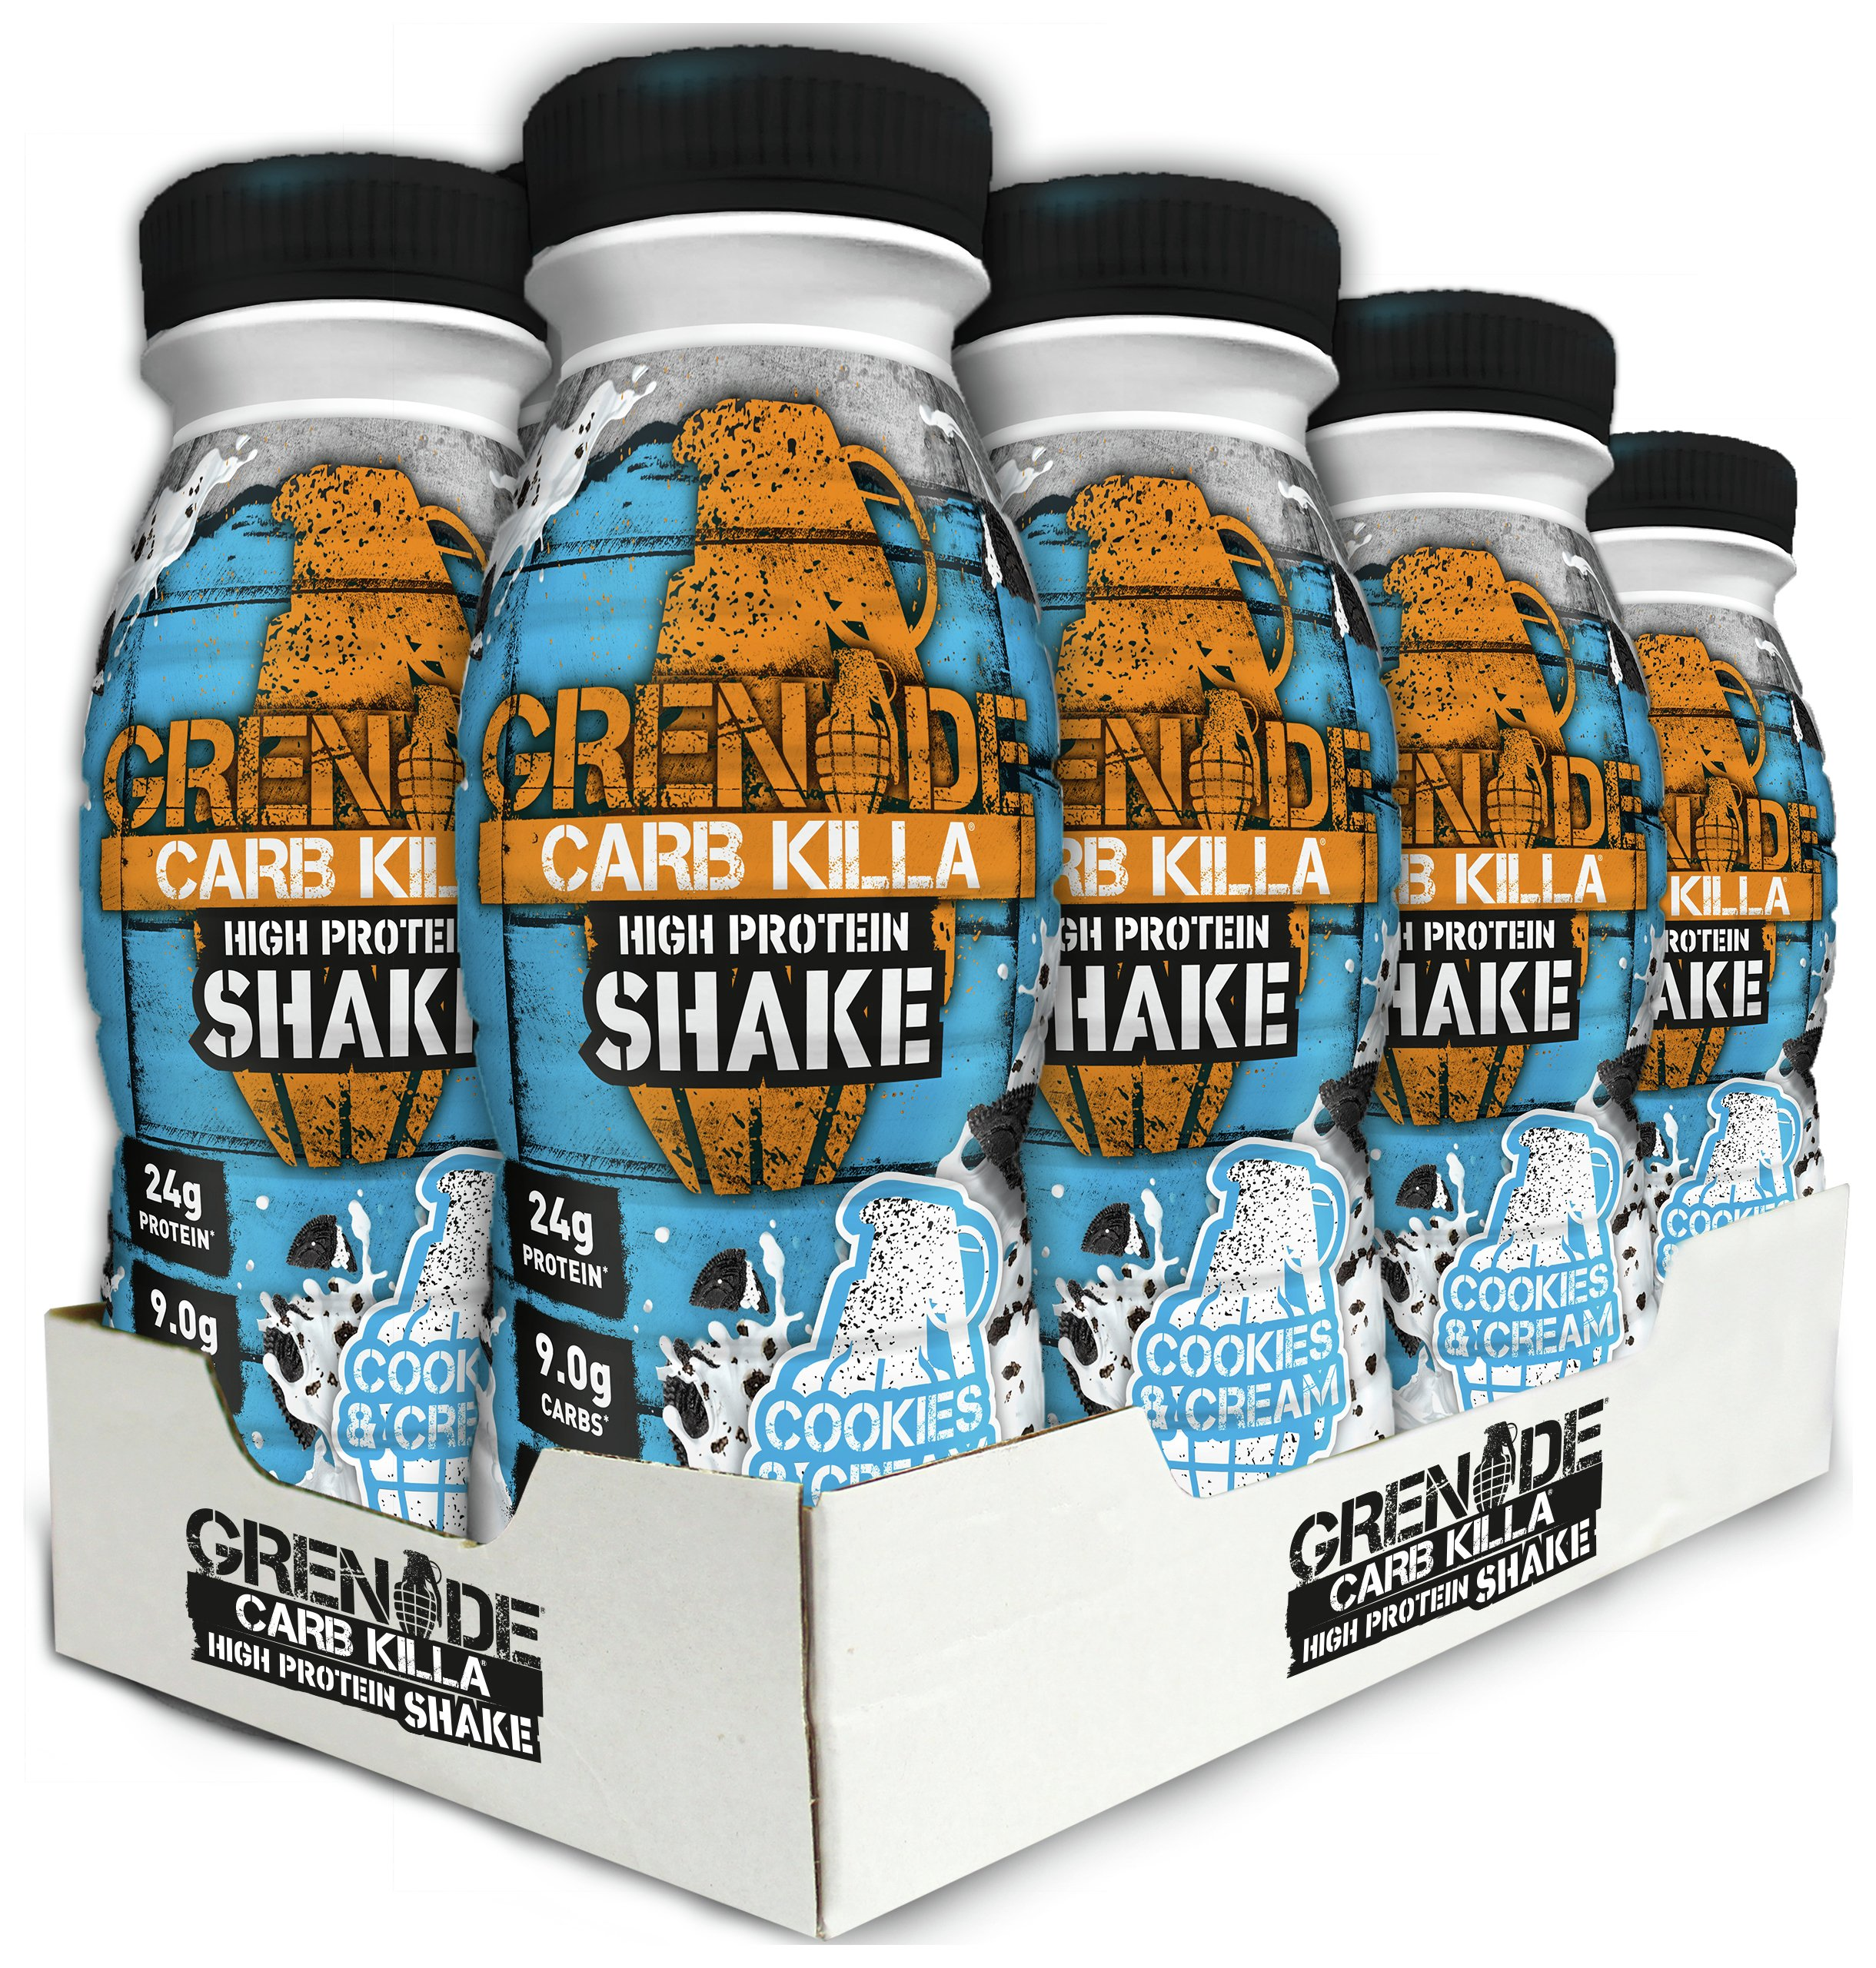 Grenade - Carb Killa Protein Shake - Cookies & Cream lowest price